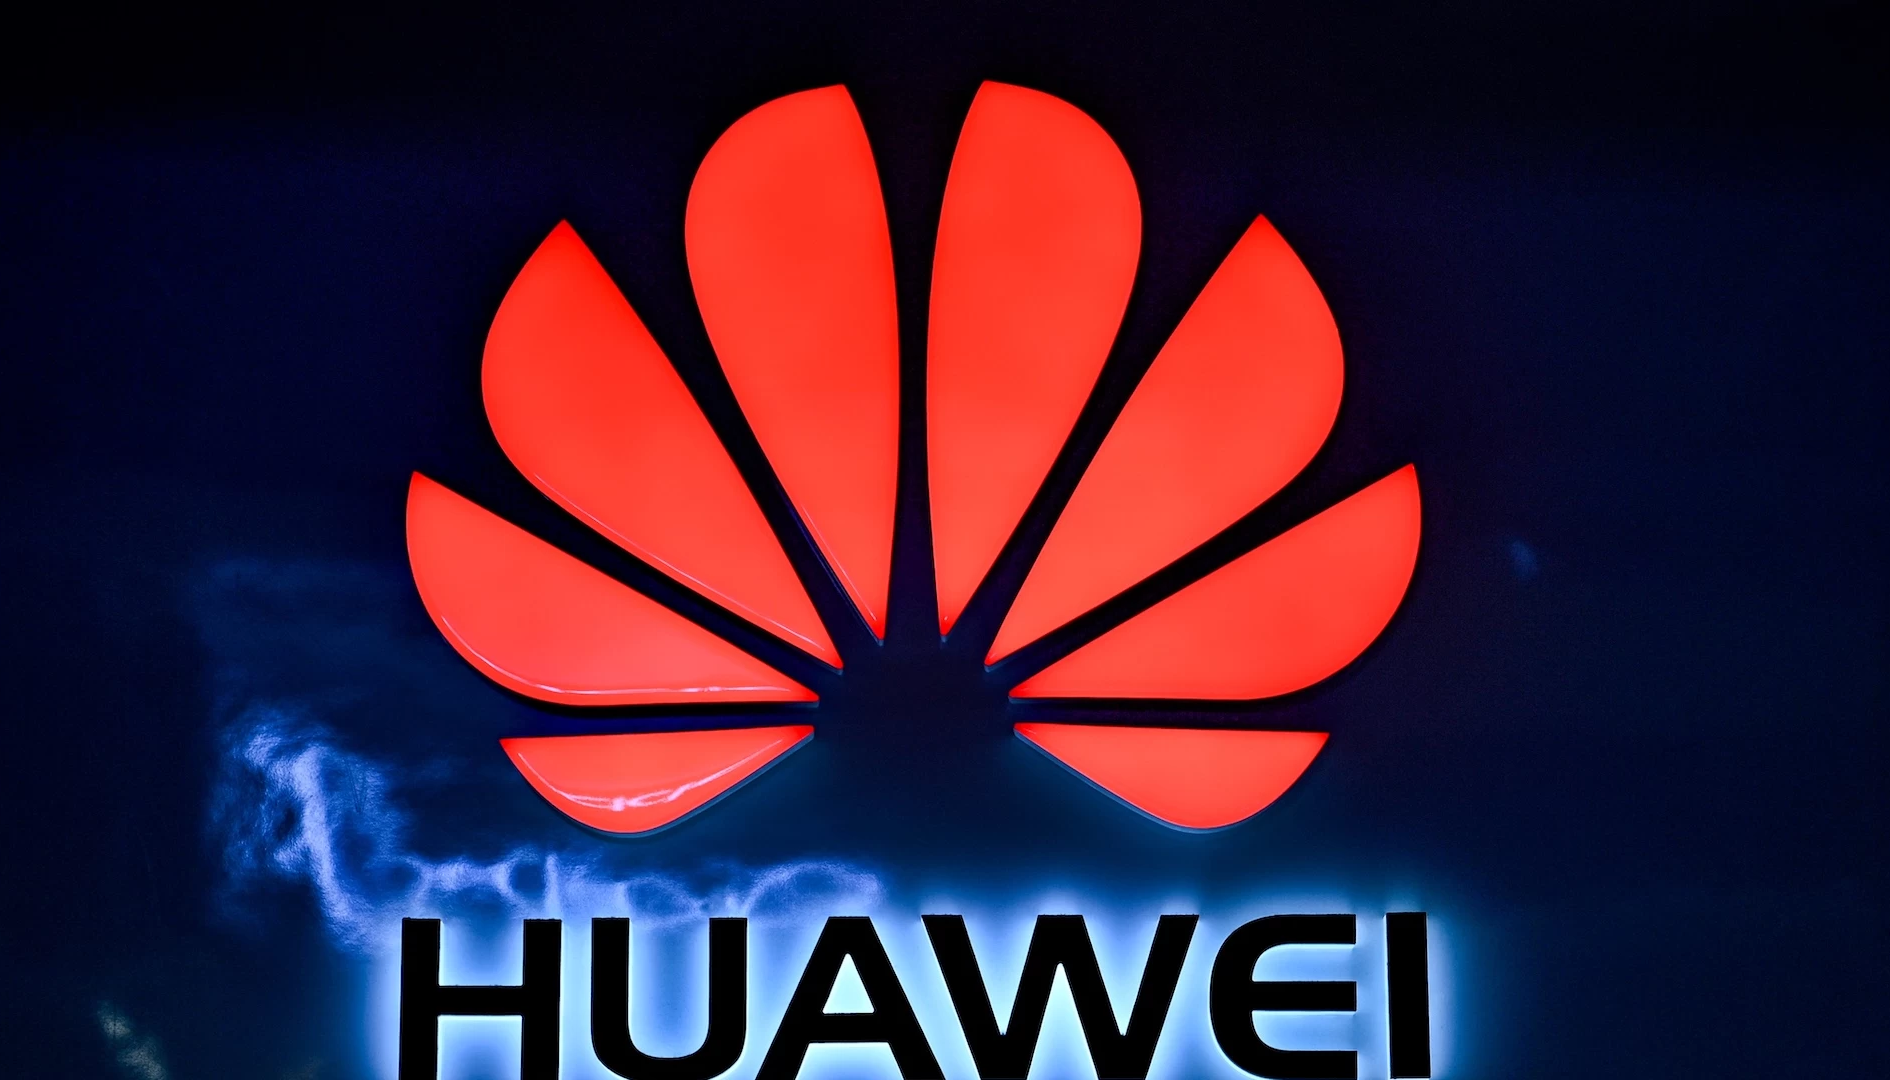 Huawei: business Europeo a rischio? No spedizioni per Nokia e Ericsson